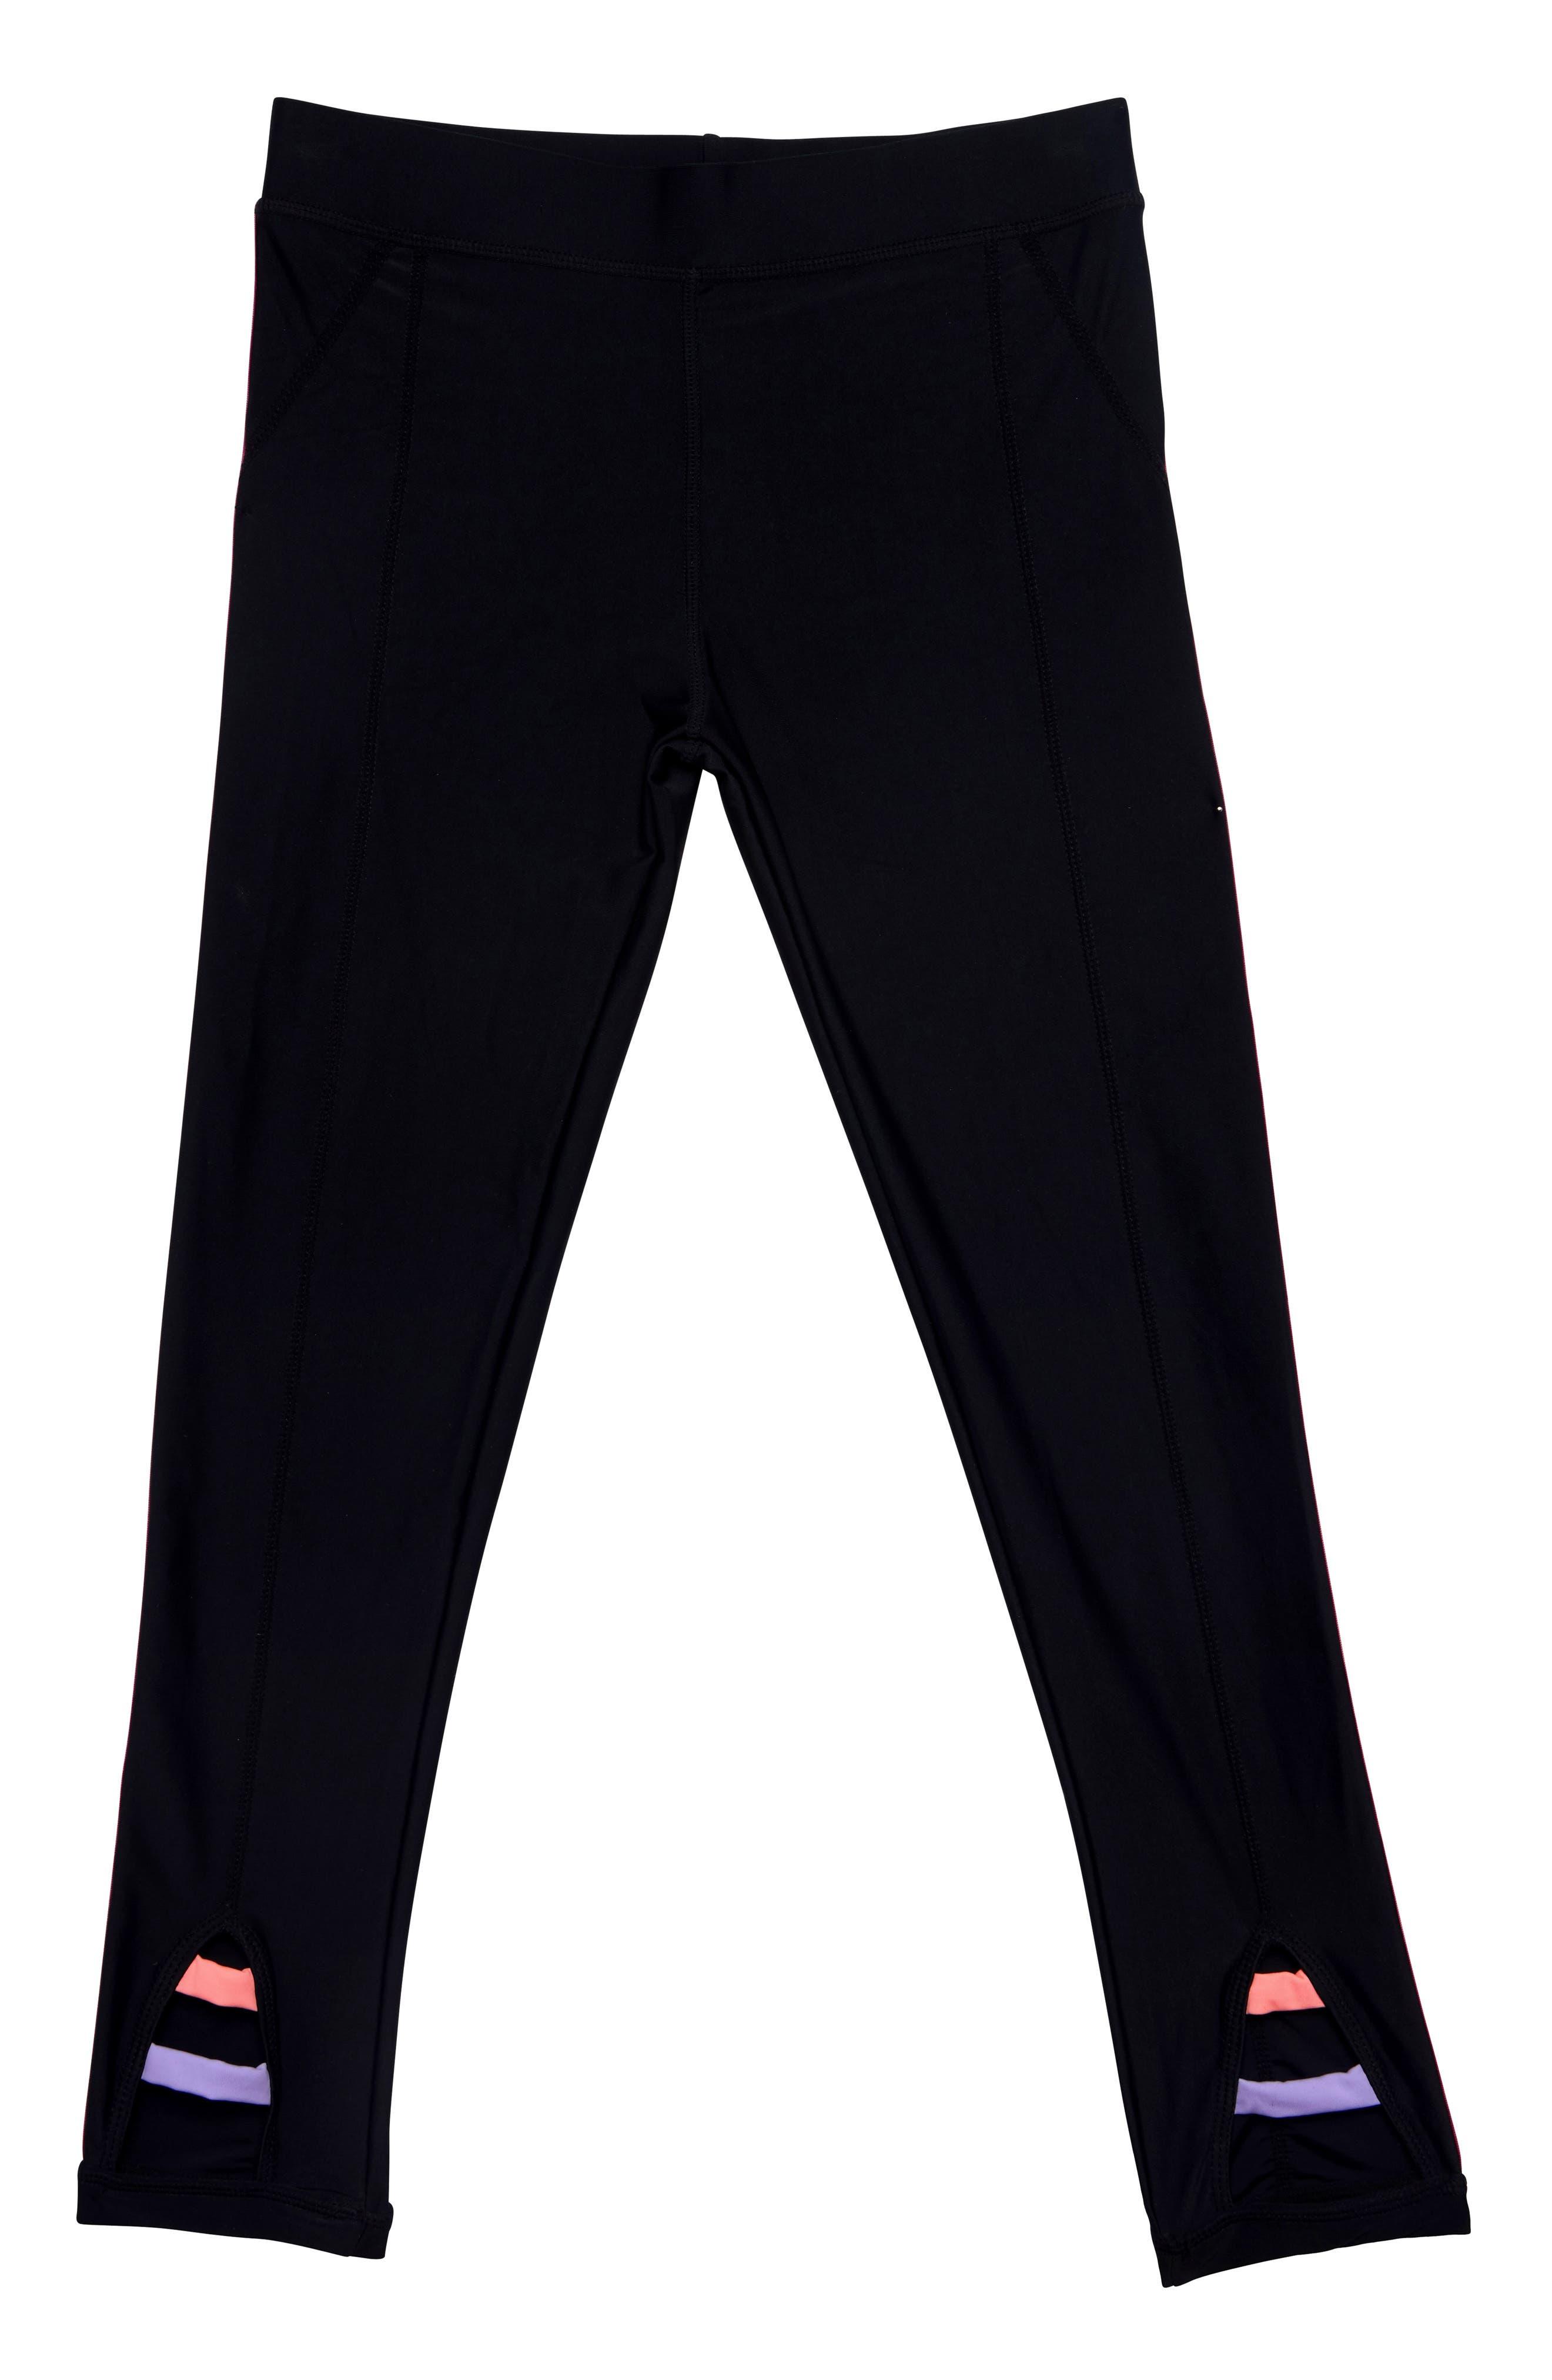 Girls Gossip Girl Color Of Fun Pants Size S (78)  Black